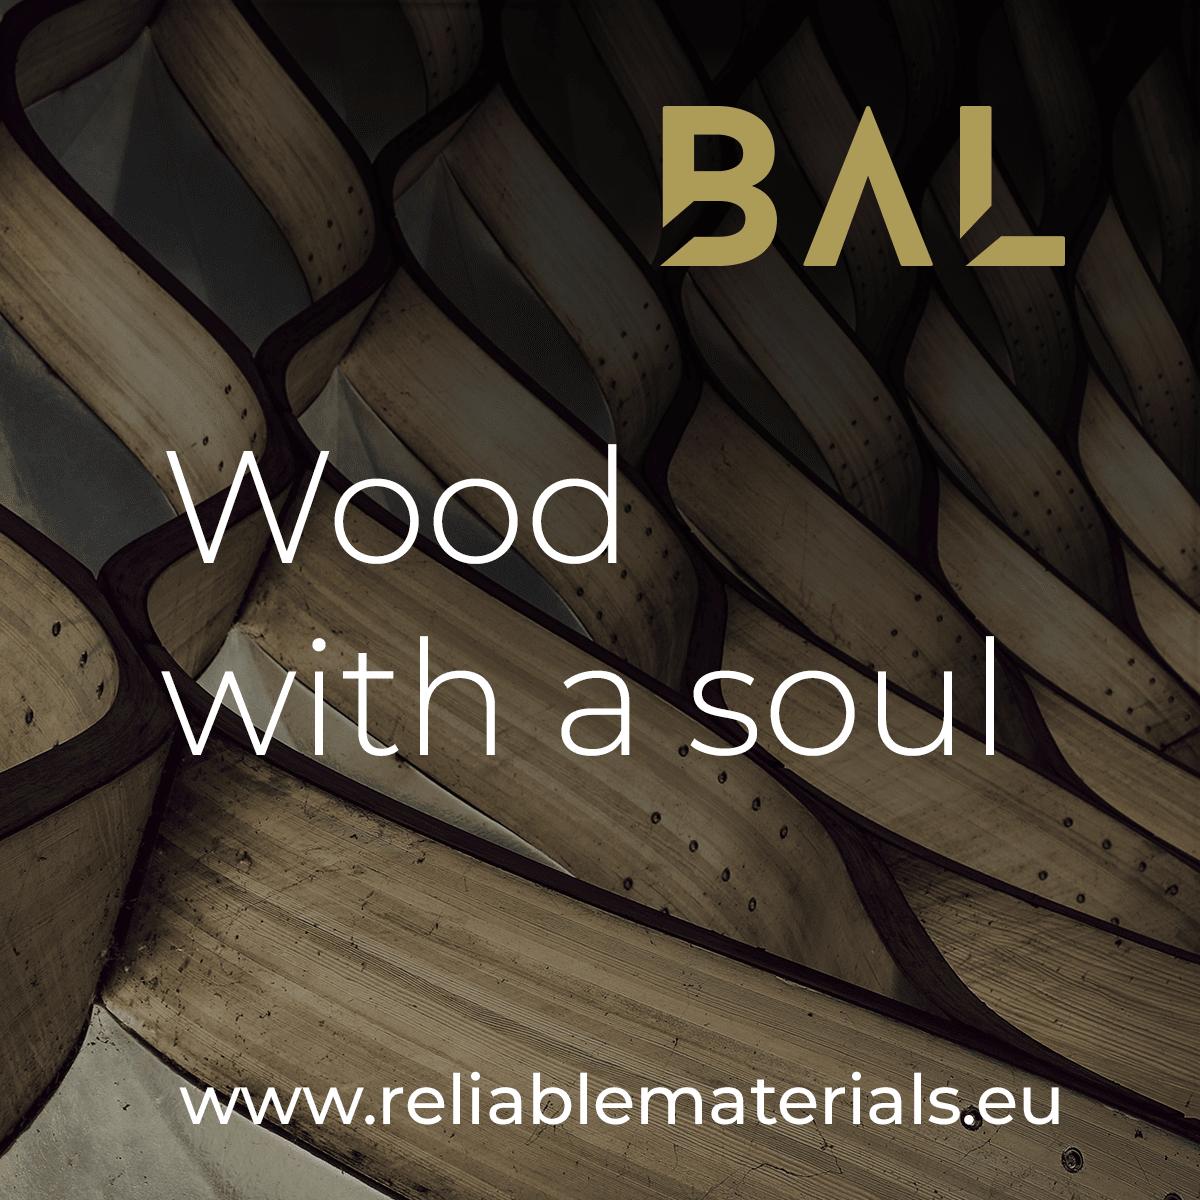 https://bbhub.eu/Reclaimed wood wholesale services Europe